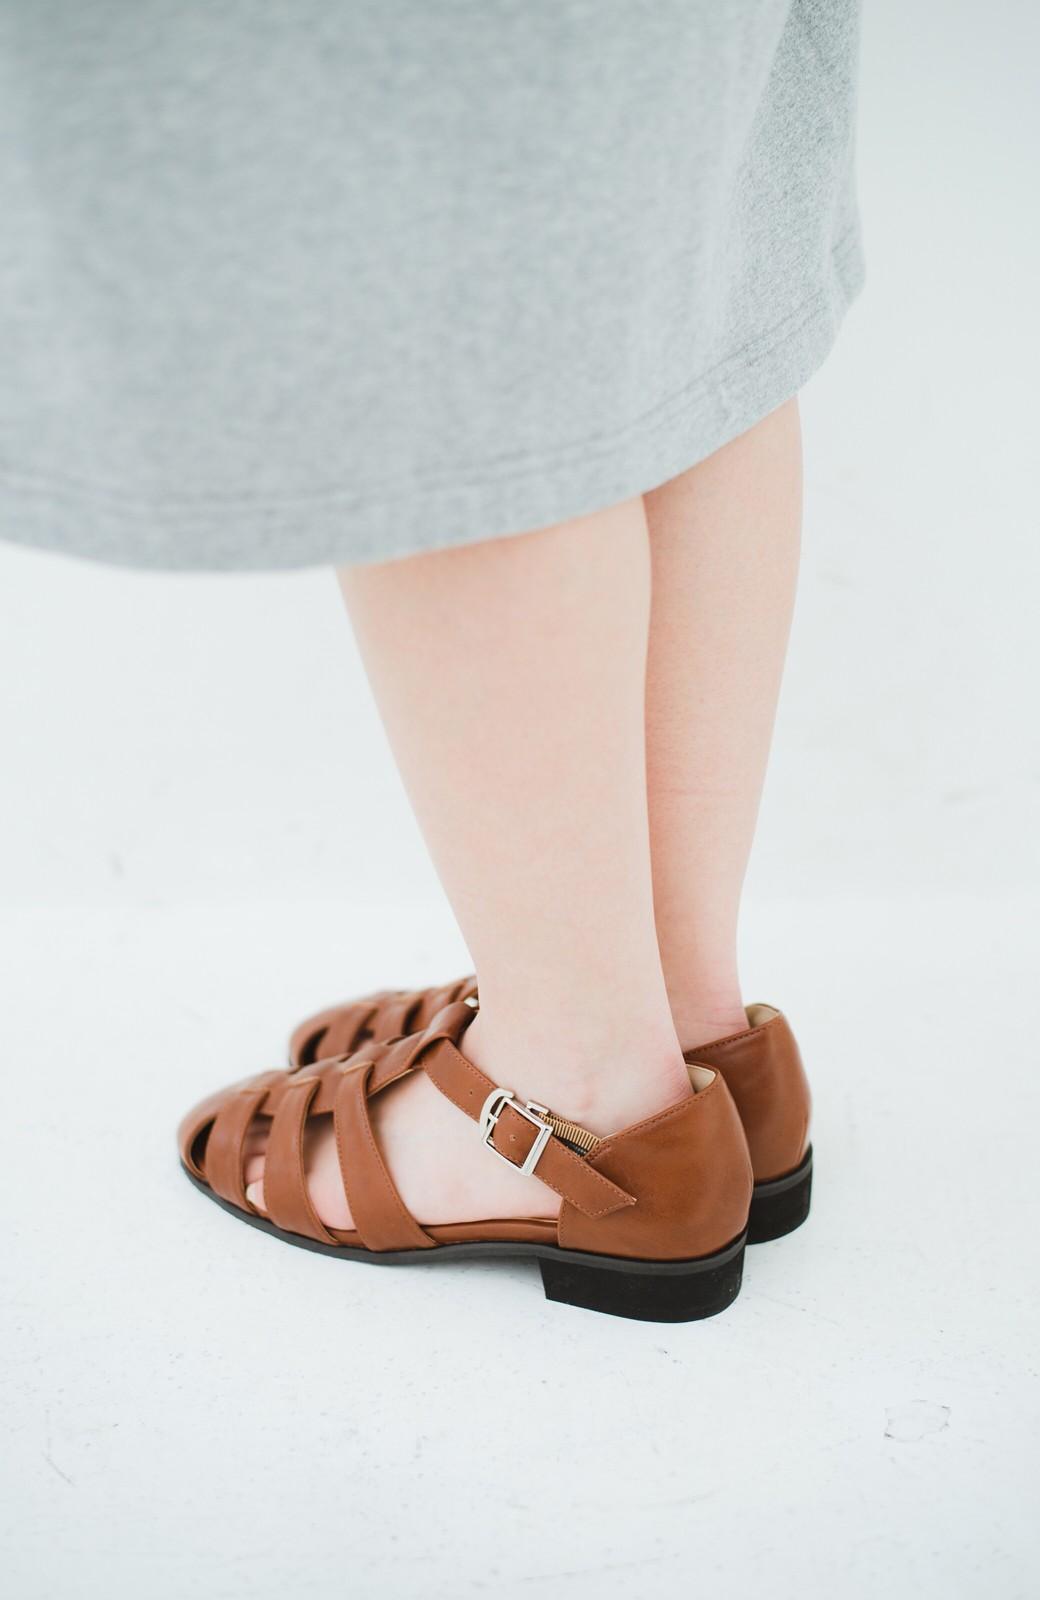 haco! 靴下でも素足でも合う 本革風編み込みサンダル <ブラウン>の商品写真4